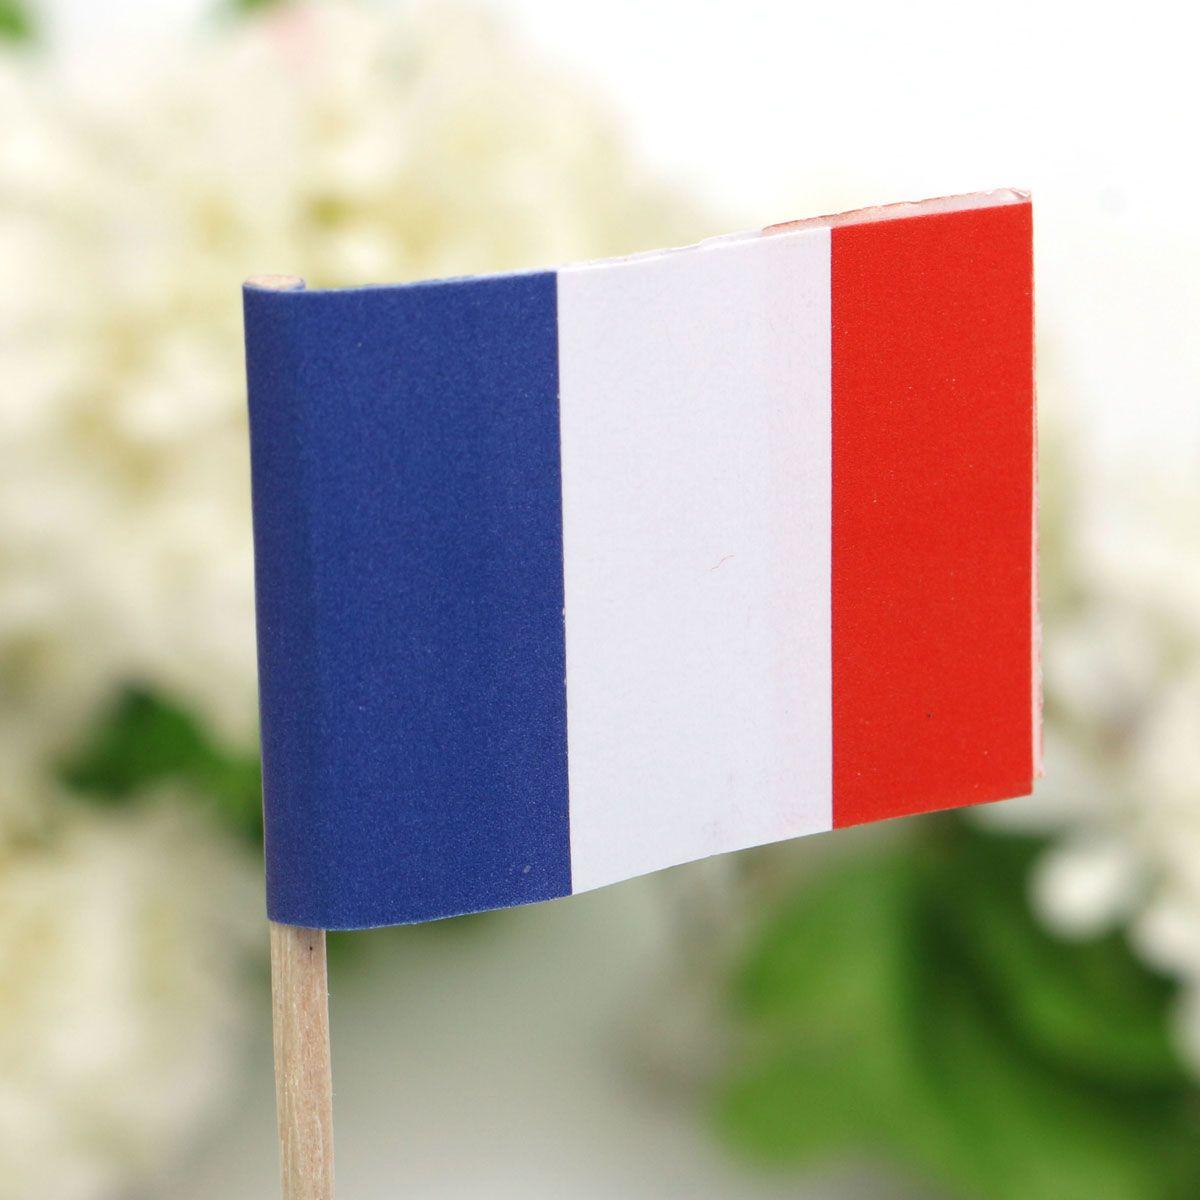 new paper mini france flag food picks party toothpicks cupcake